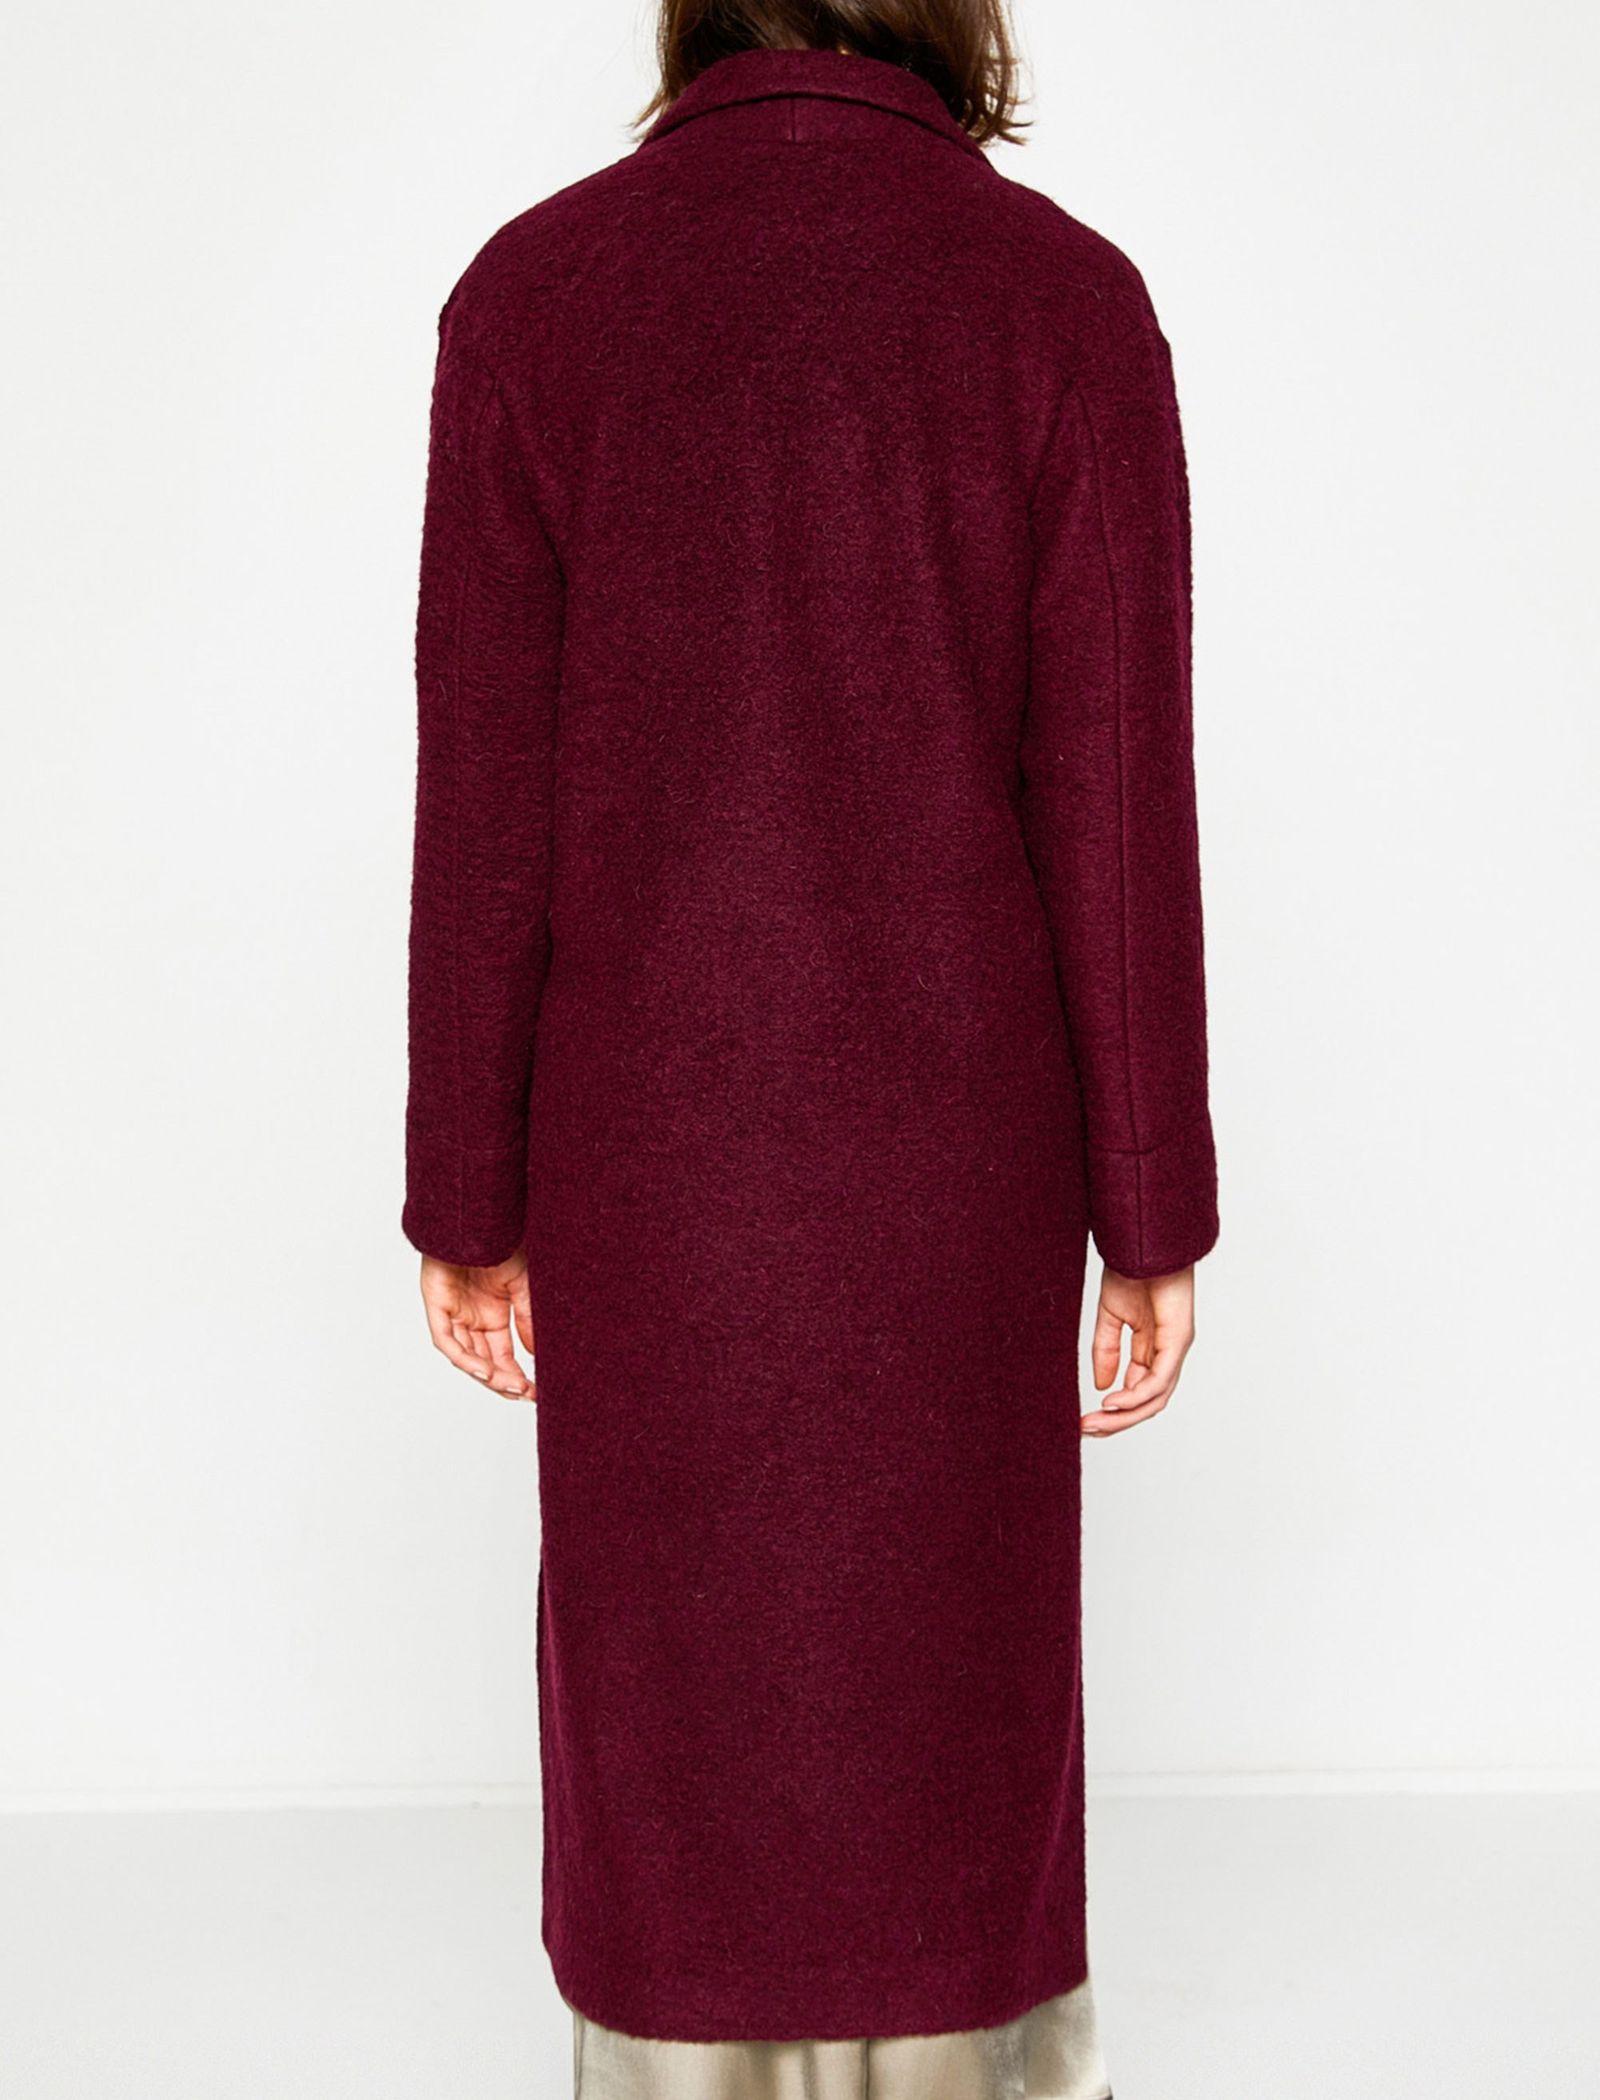 پالتو پشمی بلند زنانه - کوتون - زرشکي - 2